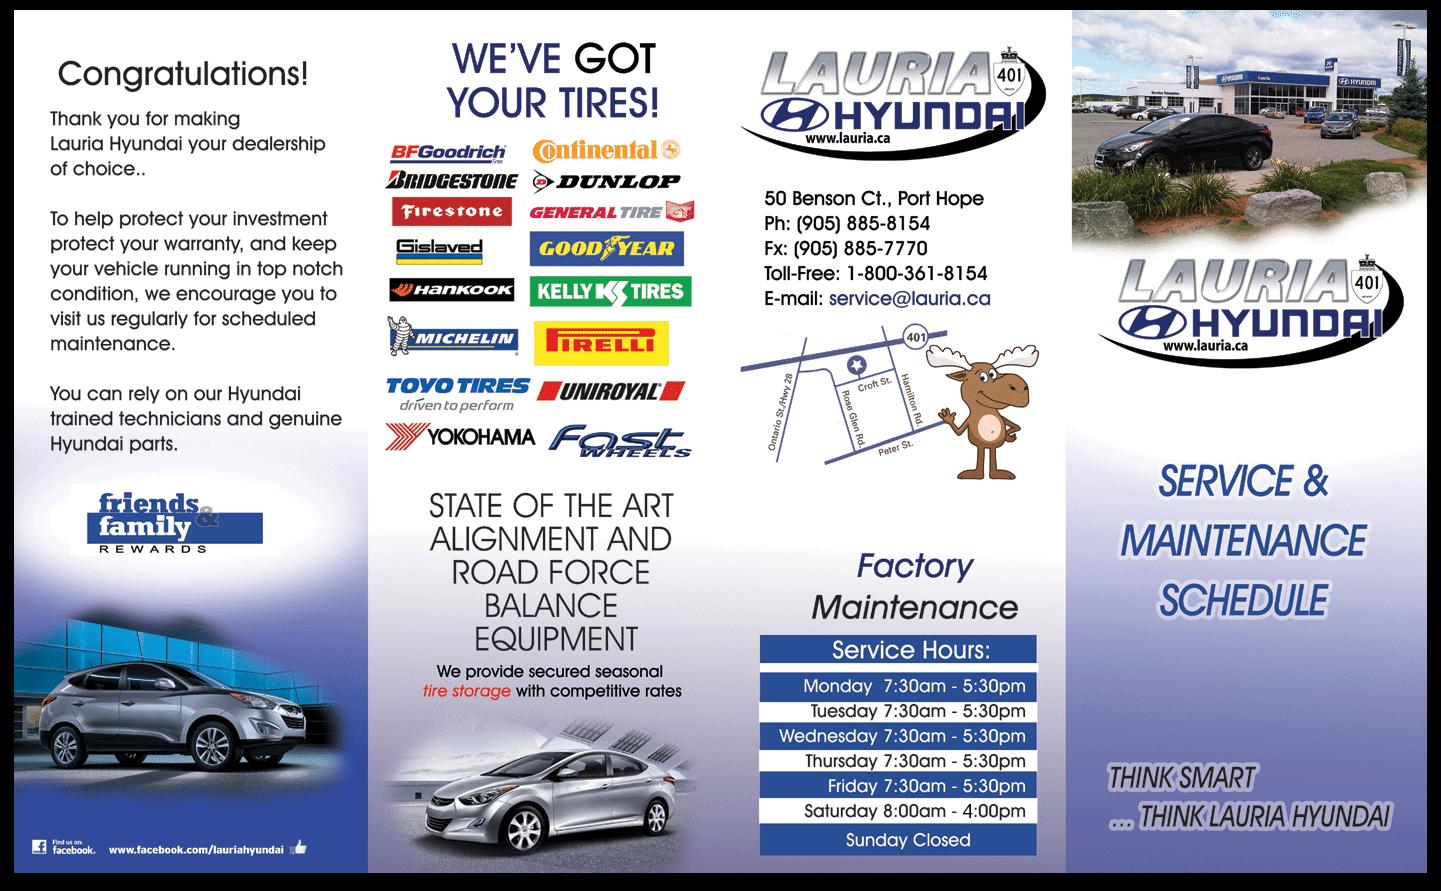 Hyundai Maintenance Schedule Recommended Service Maintenance Calendar L Lauria Hyundai L Port